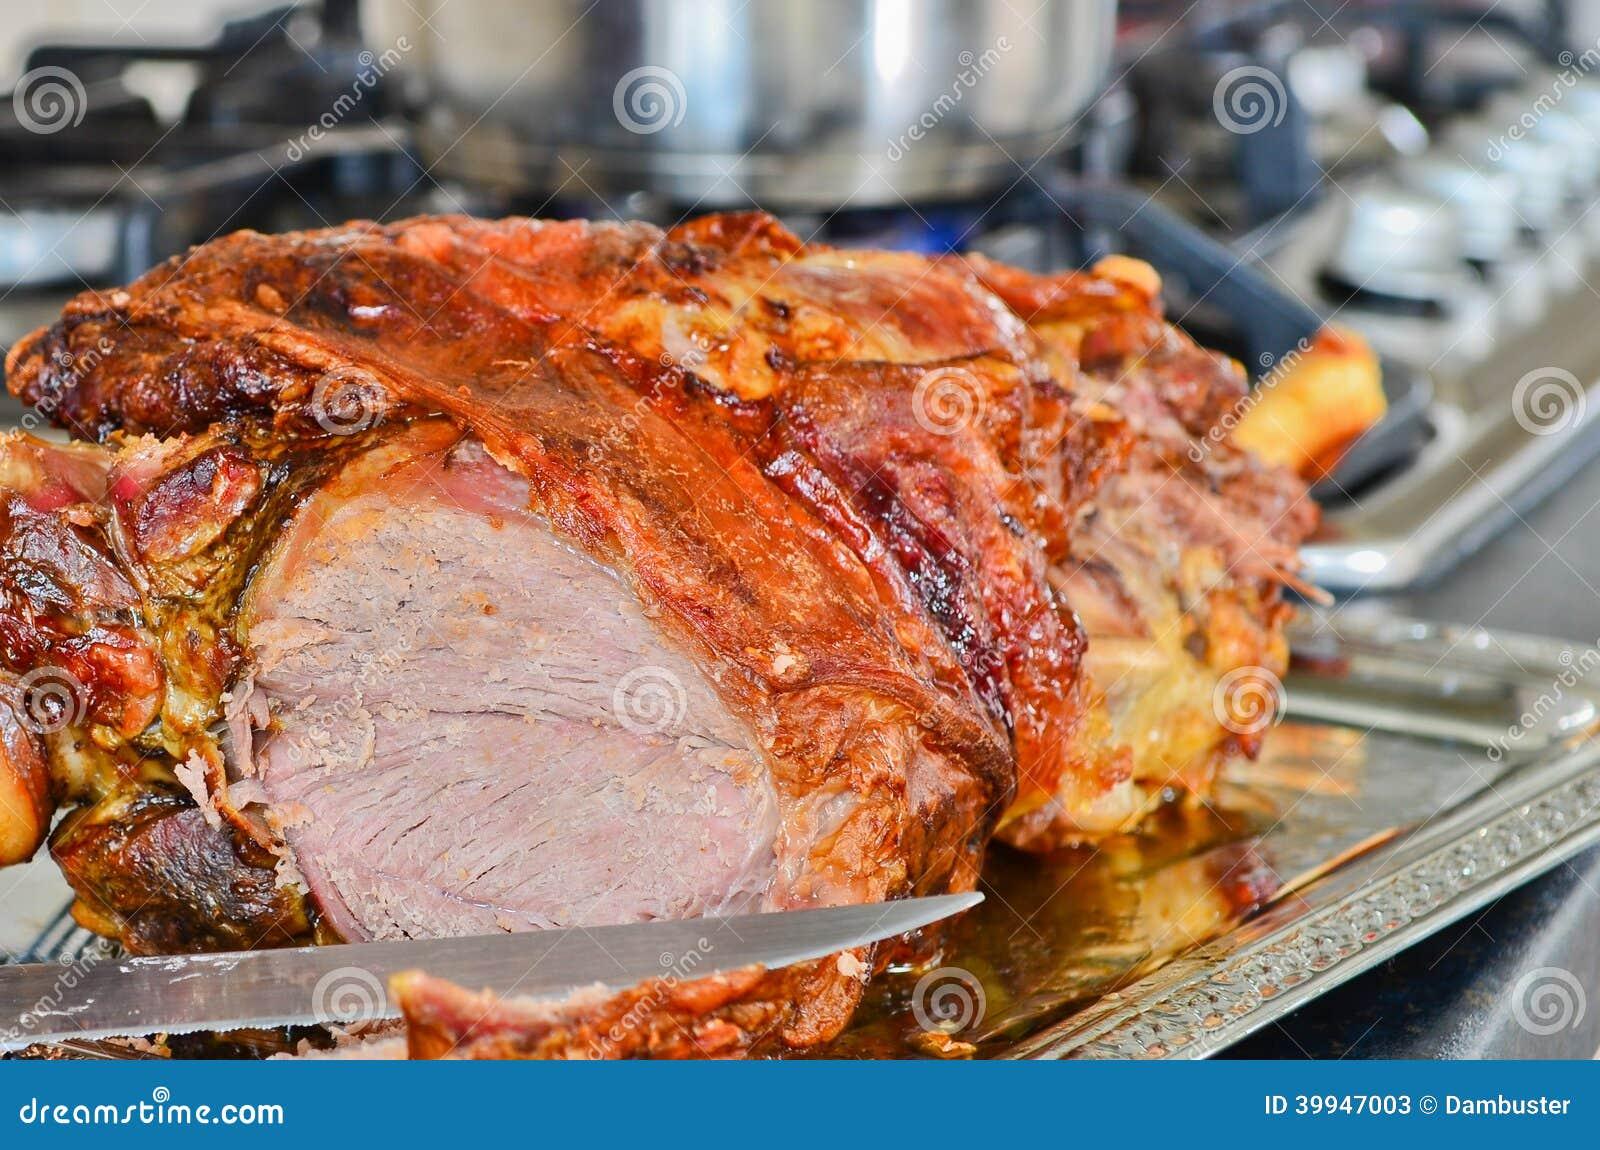 Roast Leg Of Lamb Stock Photo - Image: 39947003